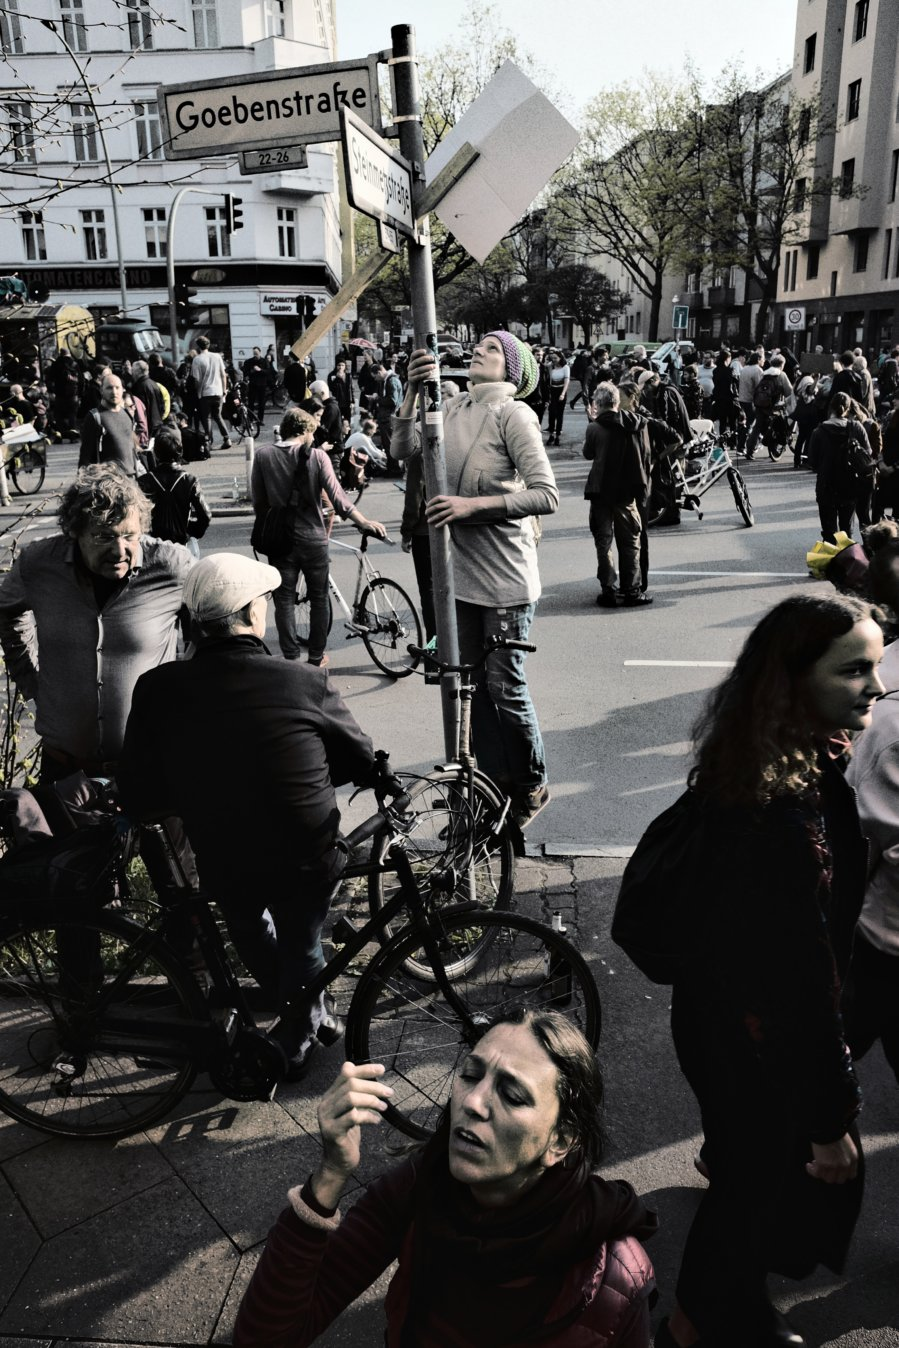 © Holger Kral • Photography - Gegen Mietwahnsinn - Berlin, Cityscape, Fujifilm X70, Germany, On my Doorstep - photo #6